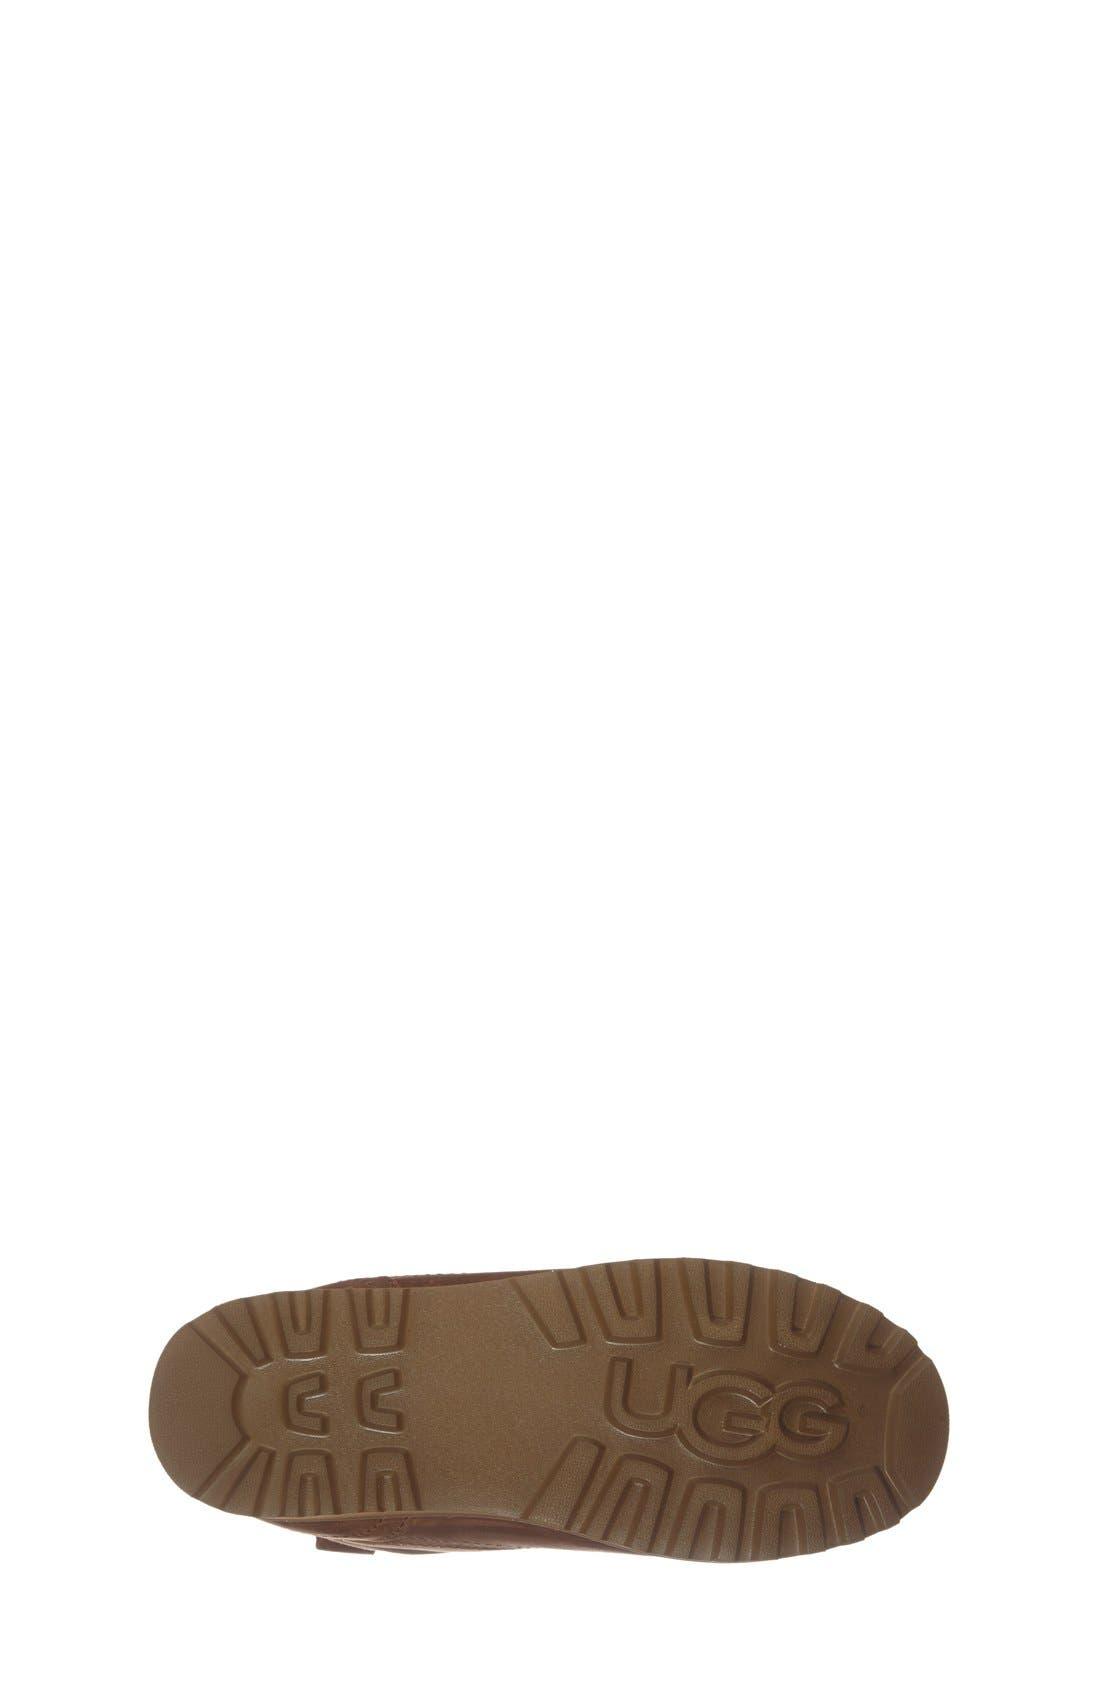 Alternate Image 4  - UGG® 'Redwood' Waterproof Boot (Toddler, Little Kid & Big Kid)